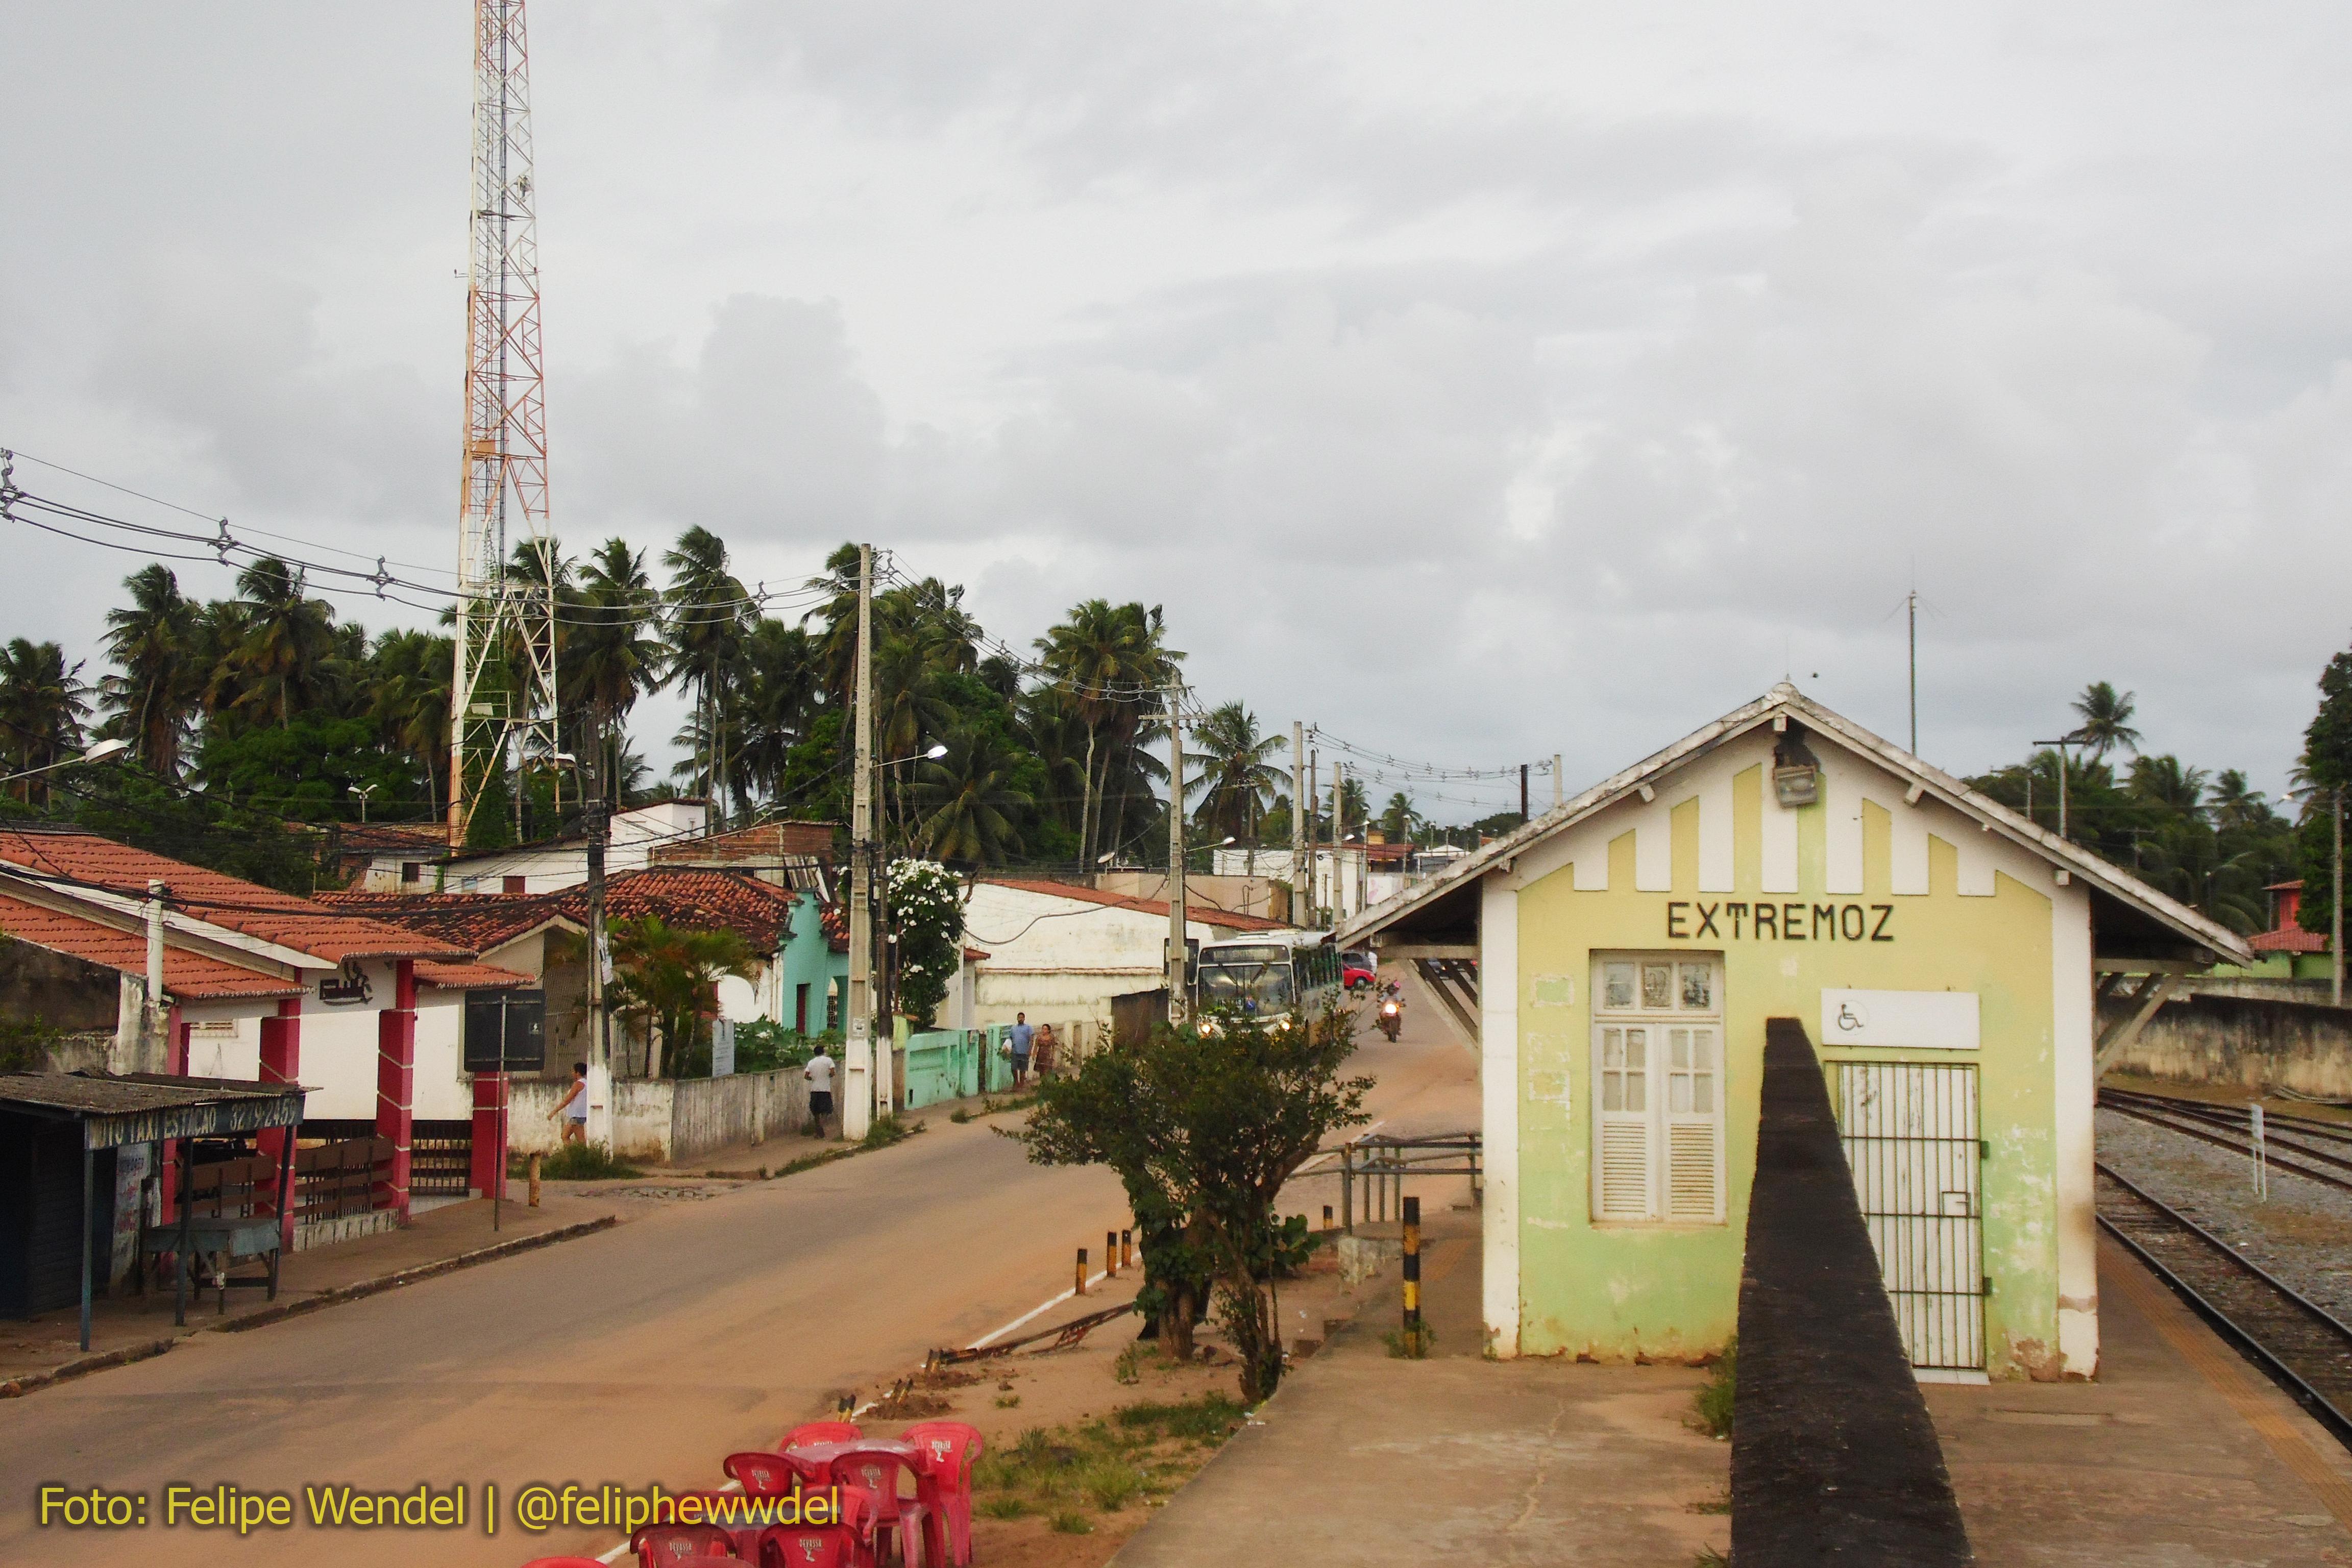 Extremoz Rio Grande do Norte fonte: upload.wikimedia.org